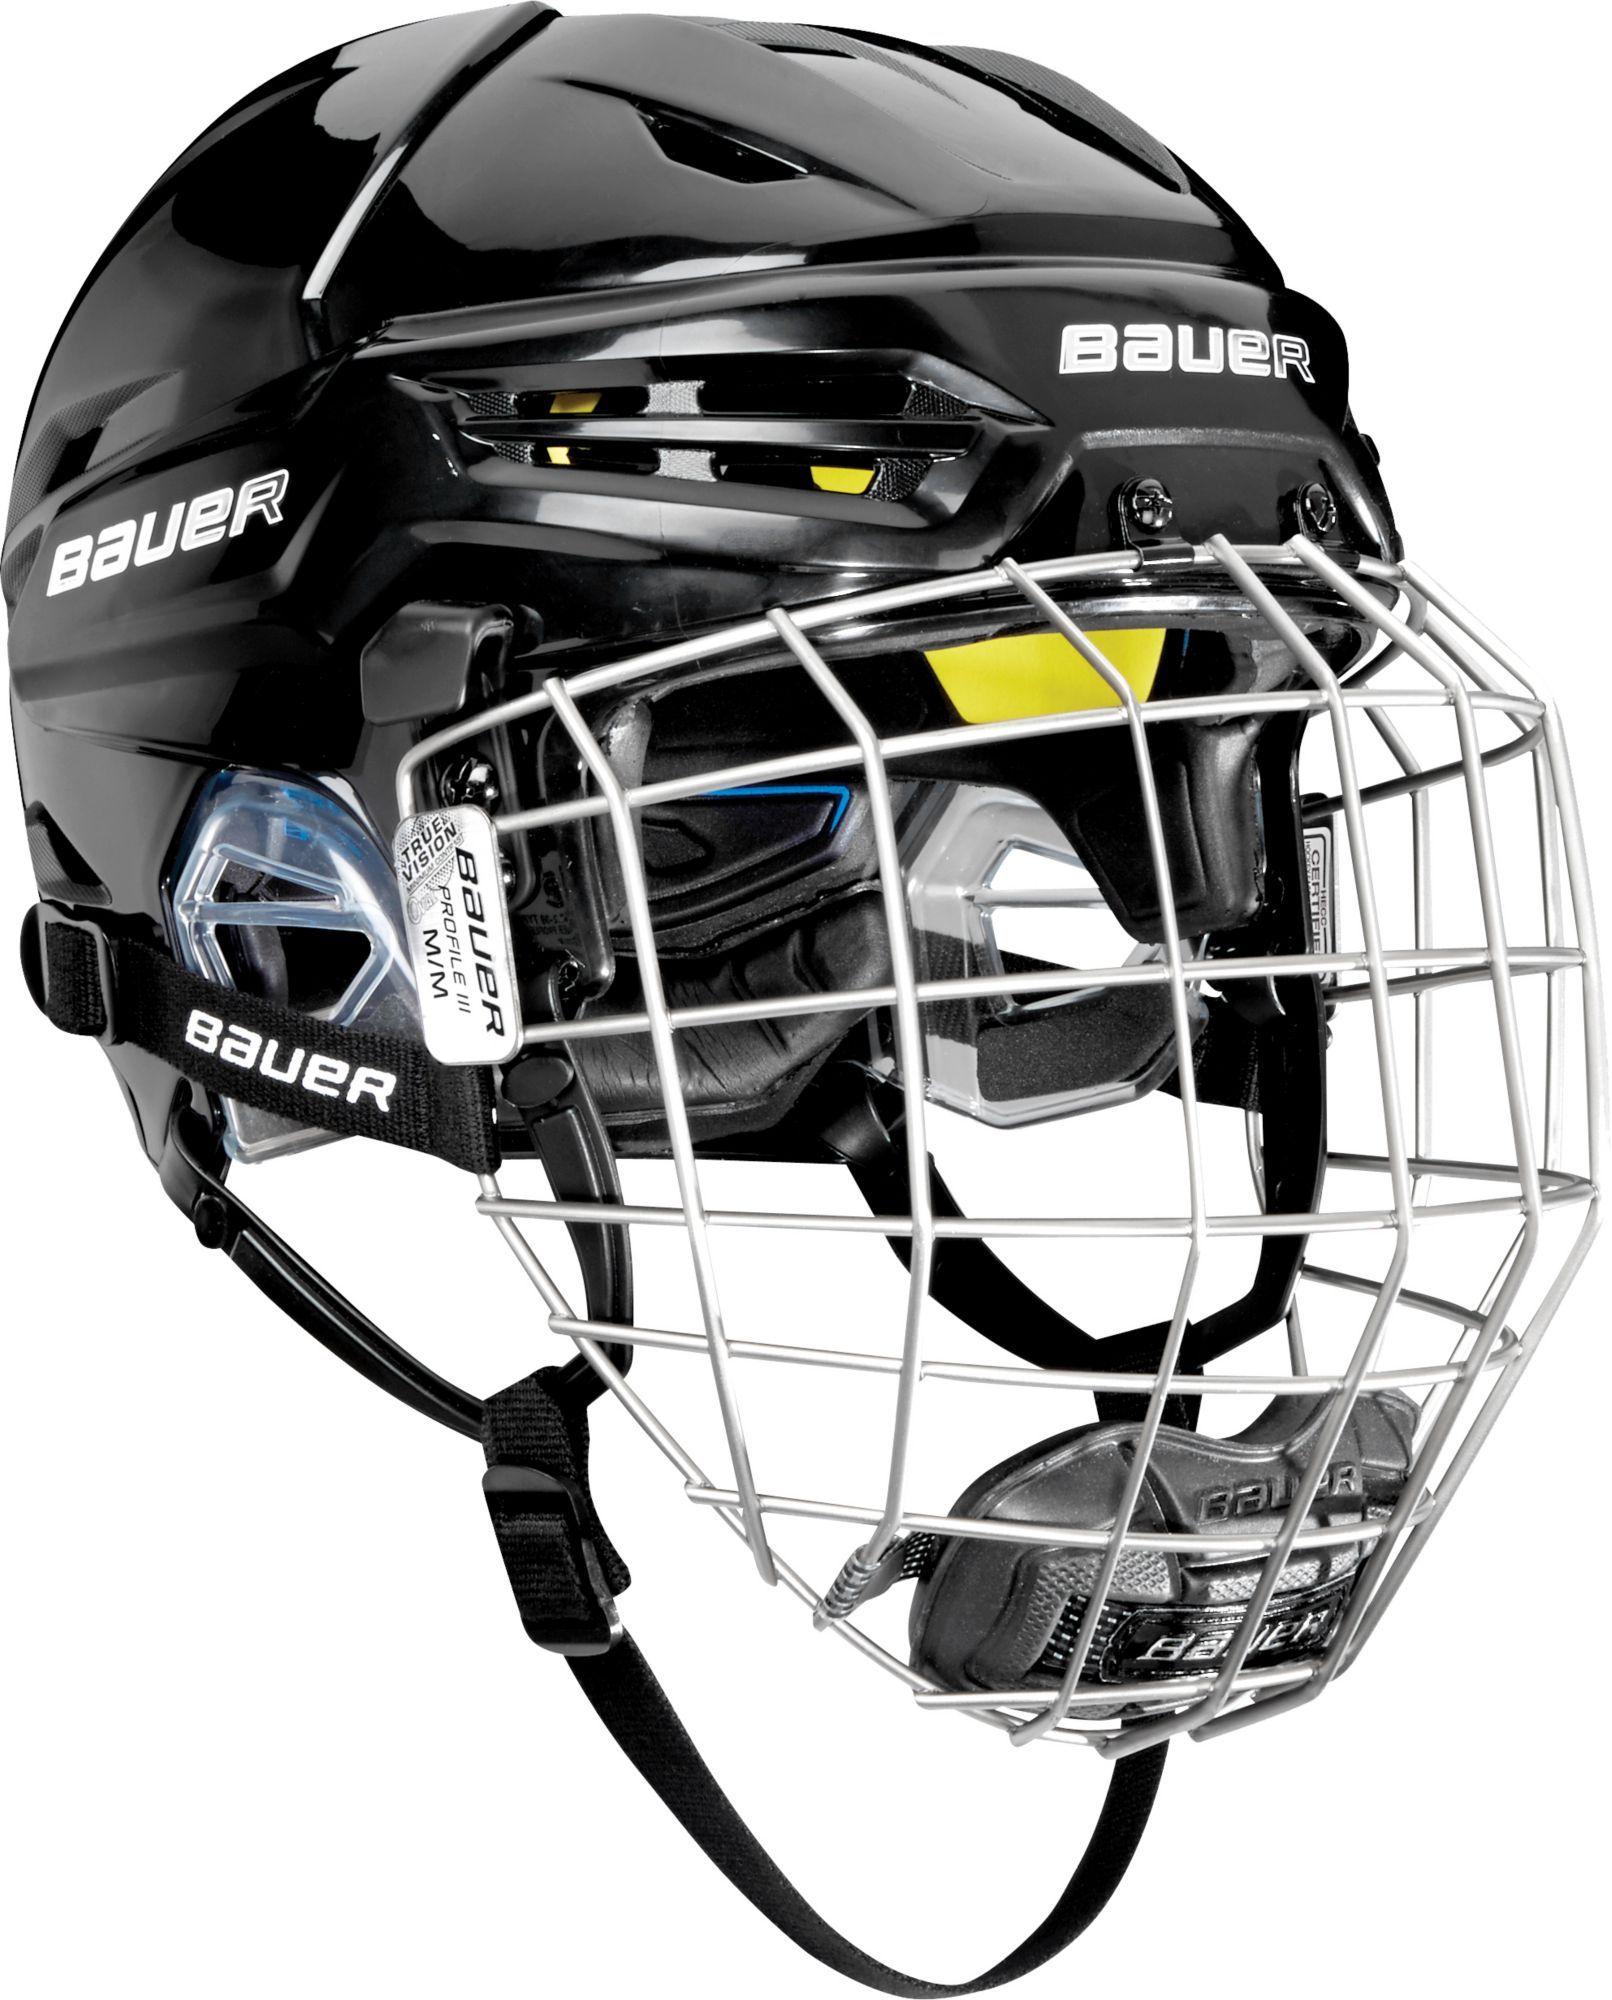 a1ddf0c1998 Bauer Senior RE-AKT 95 Ice Hockey Helmet Combo